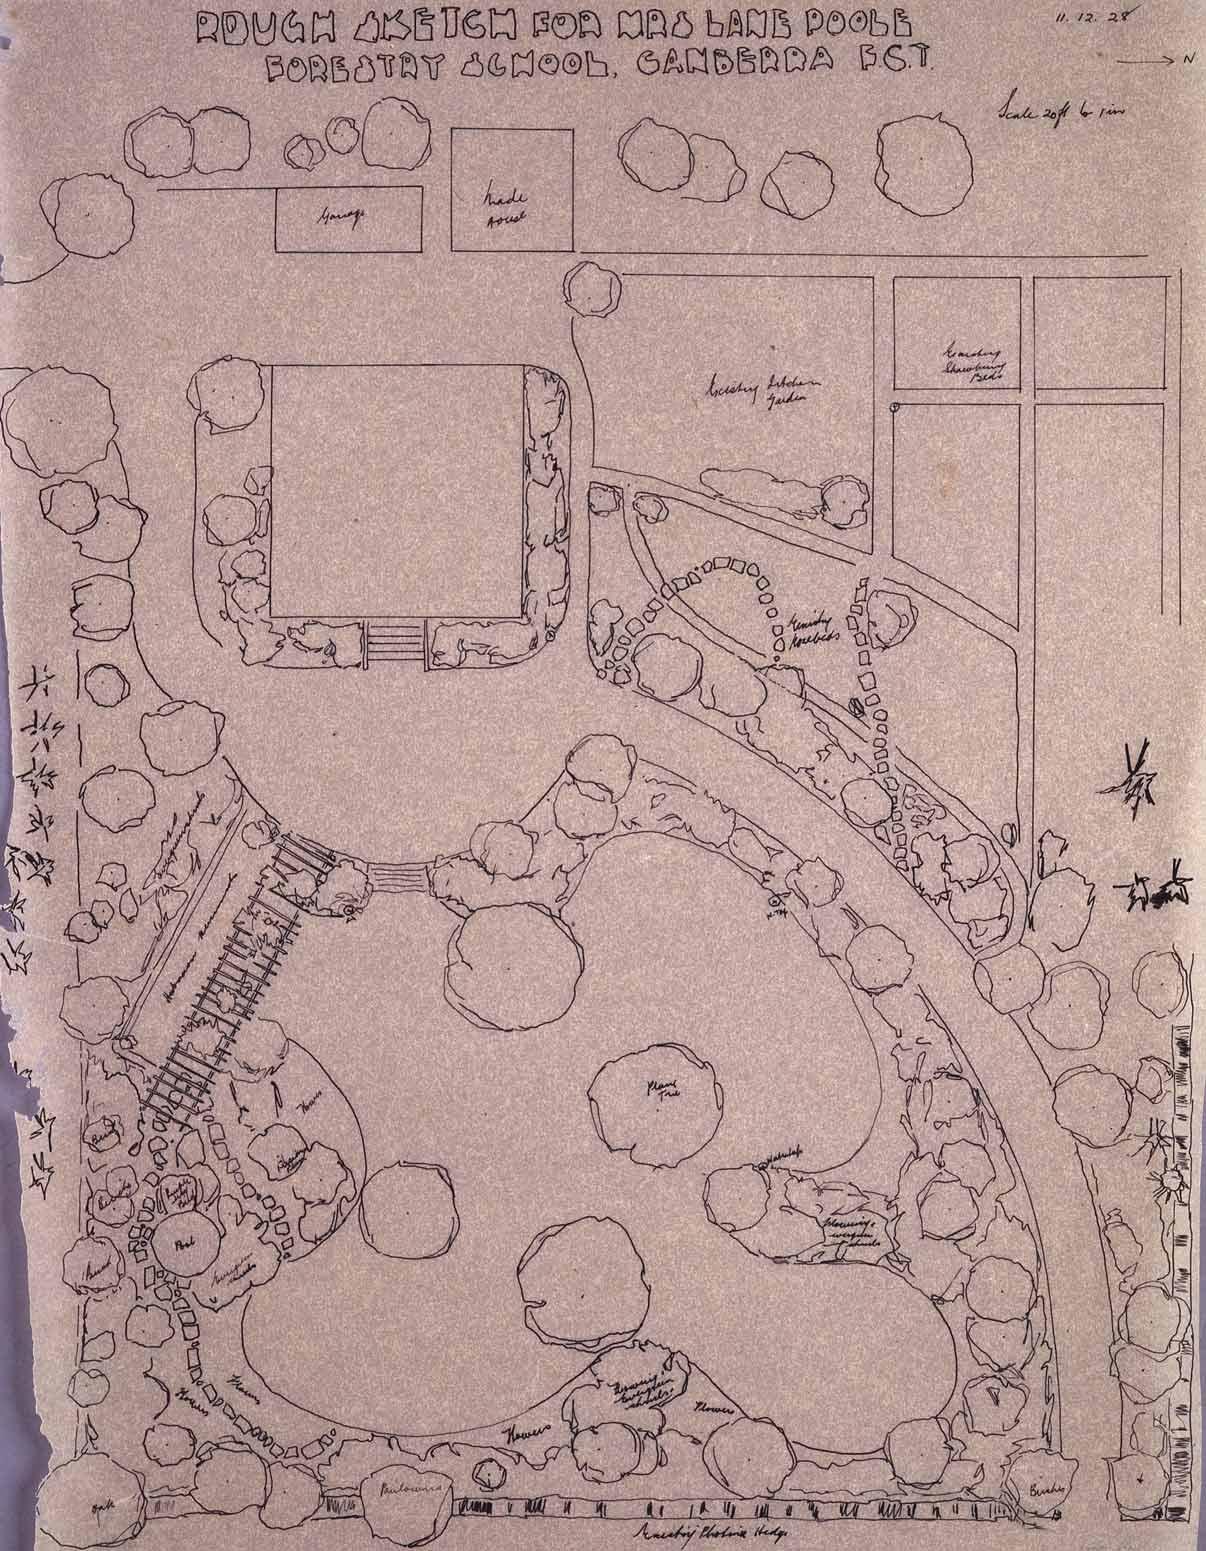 Rough Sketch Garden Plan Forestry School